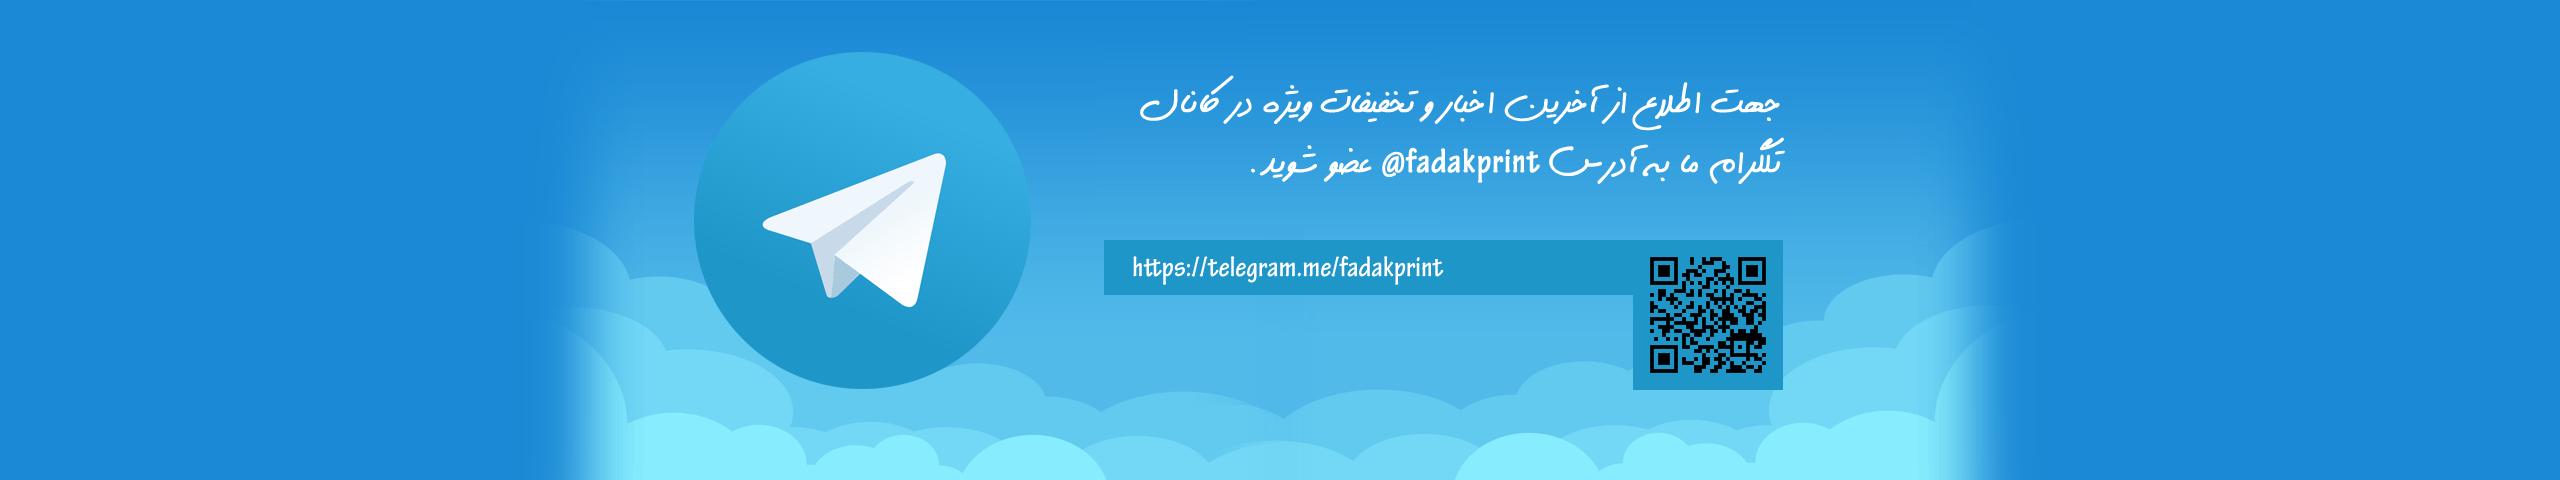 fadakprint-telegram4